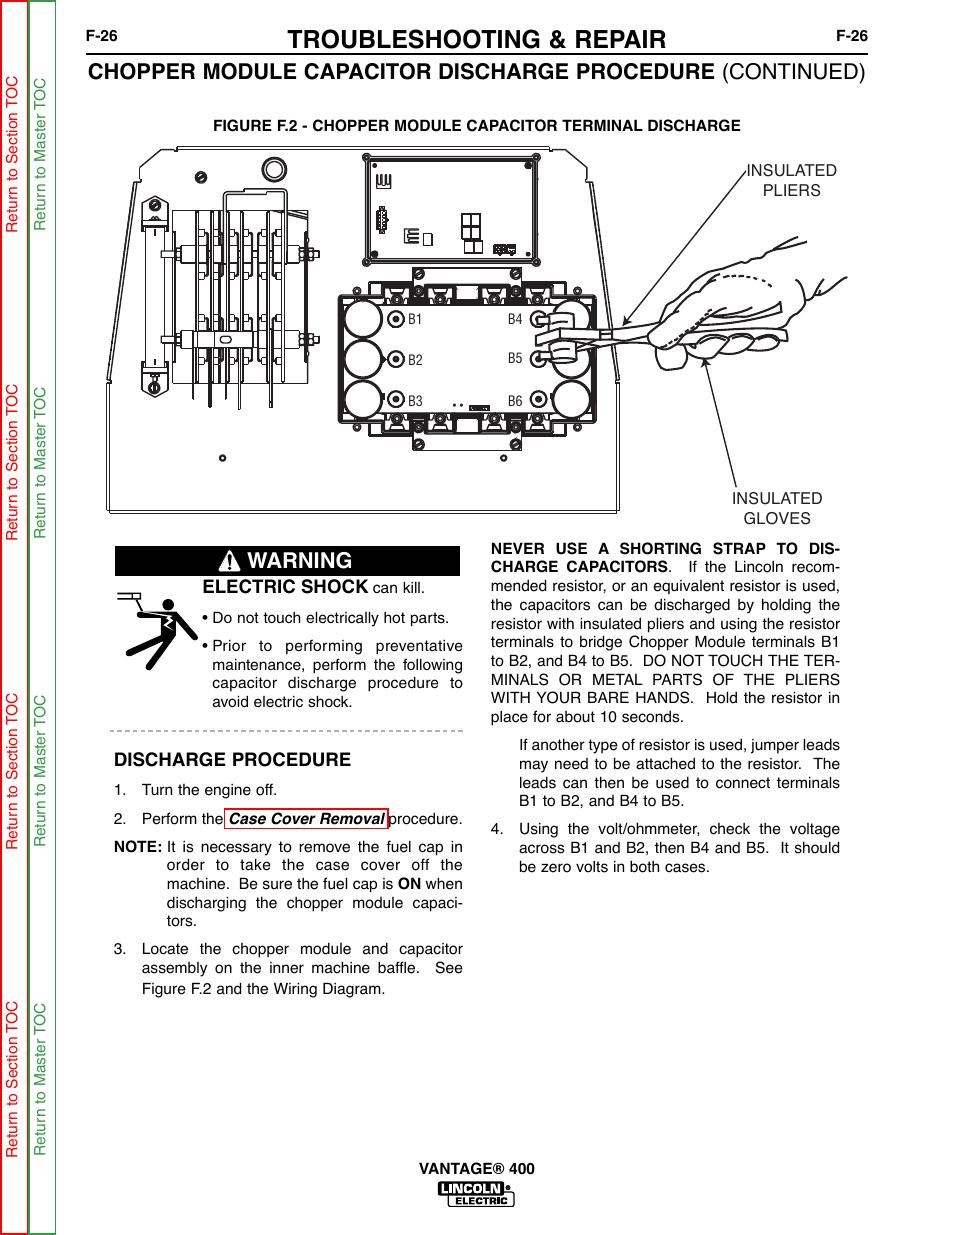 lincoln vantage 400 wiring diagram wiring diagram Unicell Wiring Diagram lincoln vantage 400 wiring diagram